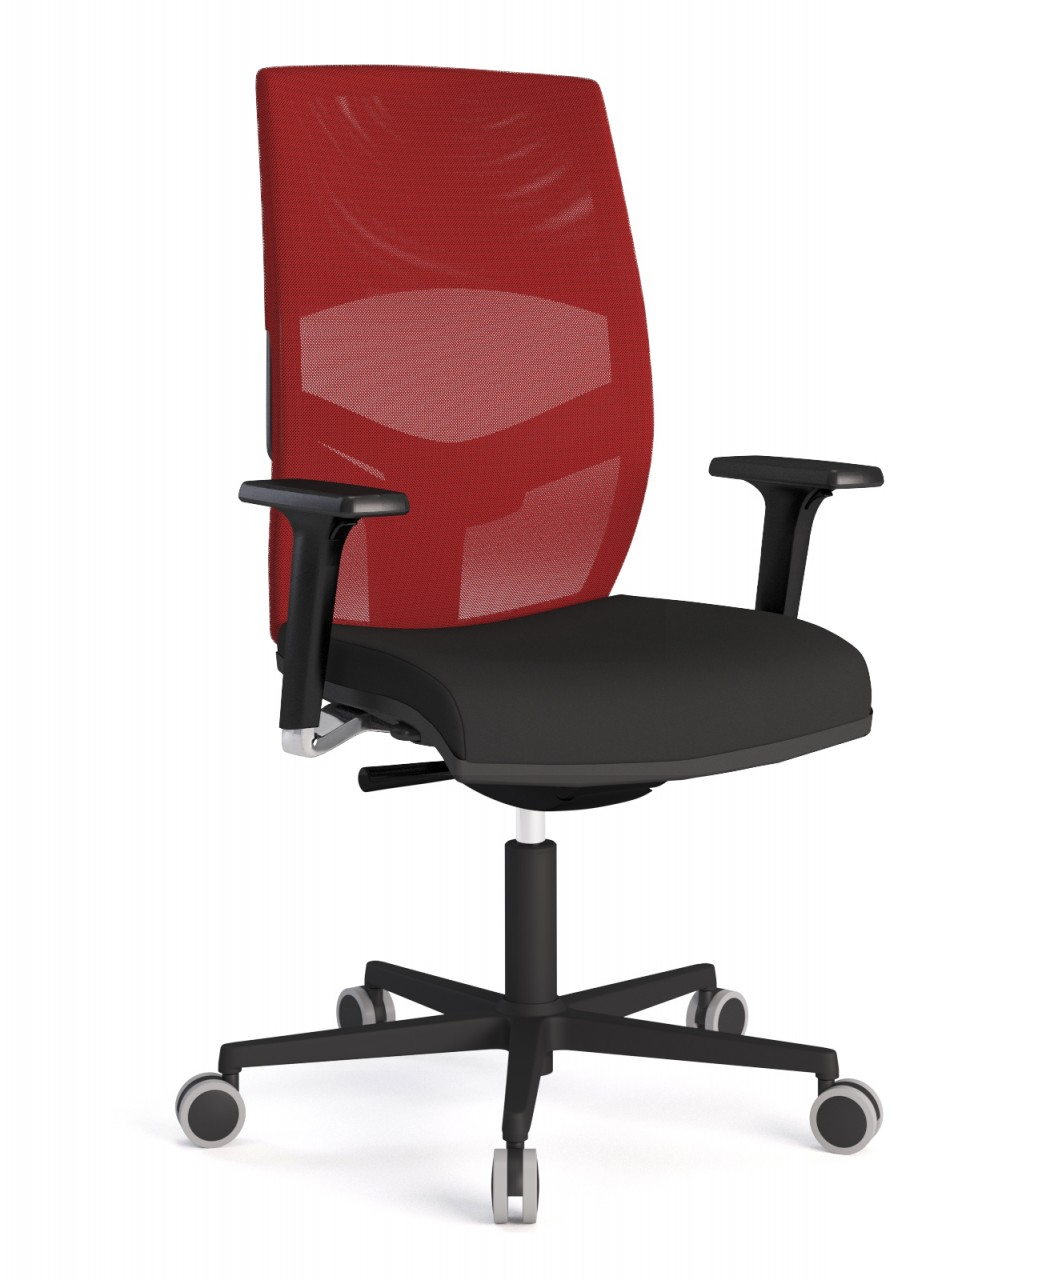 si ge de bureau easy achat si ges de bureau 339 00. Black Bedroom Furniture Sets. Home Design Ideas